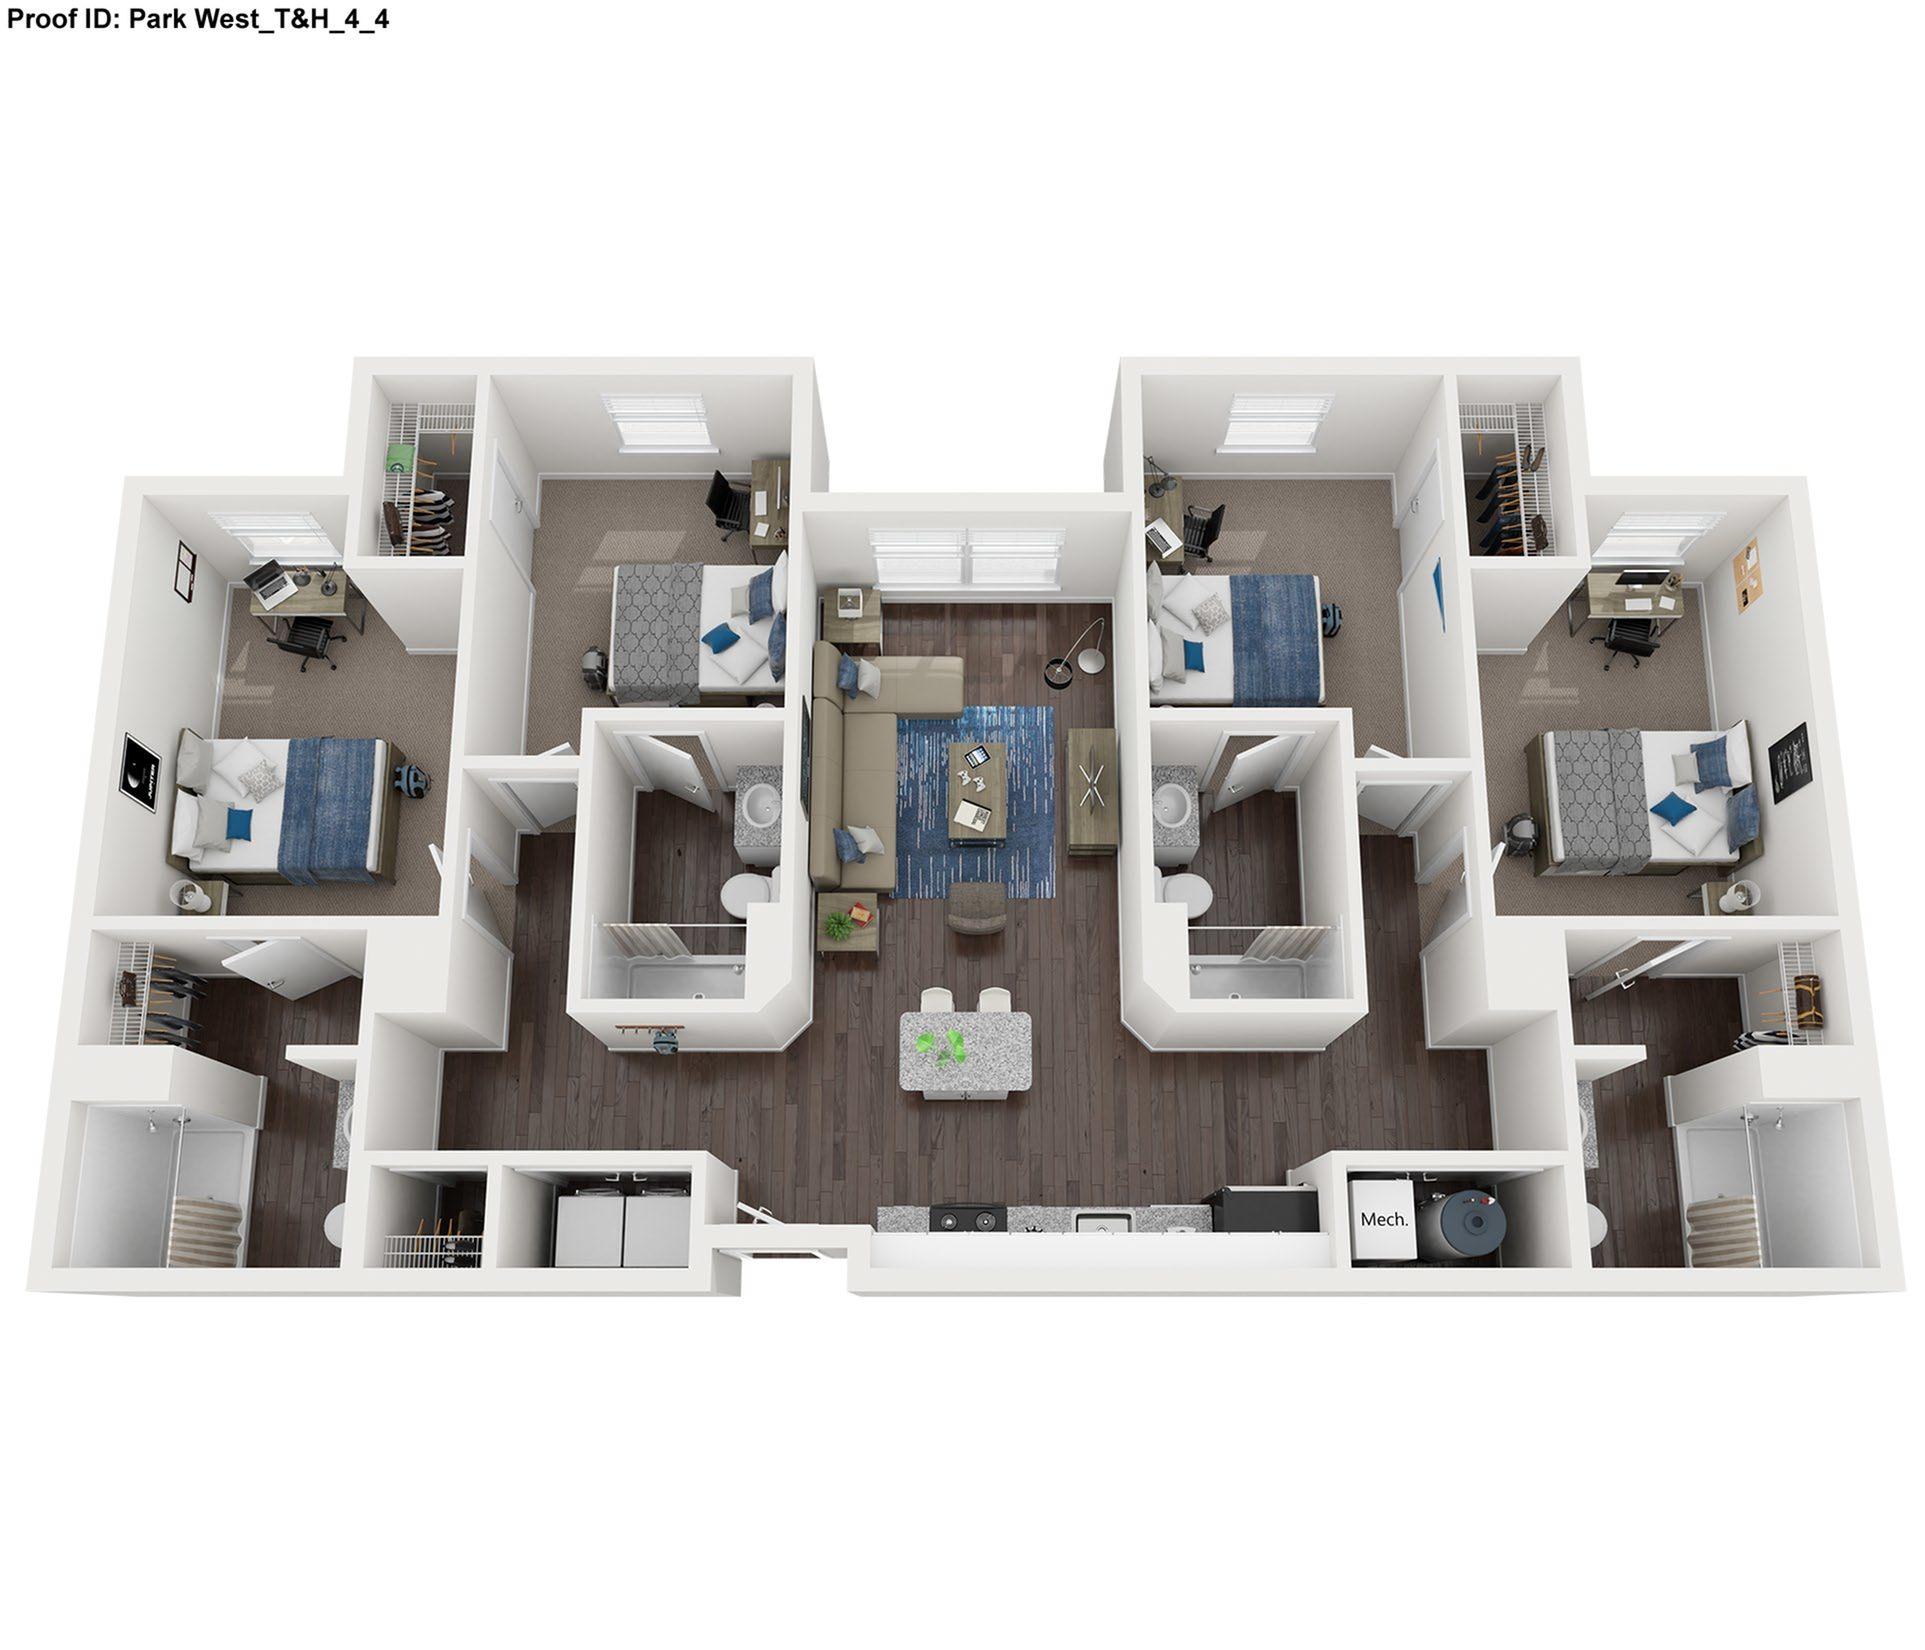 4 bdrm floor plan